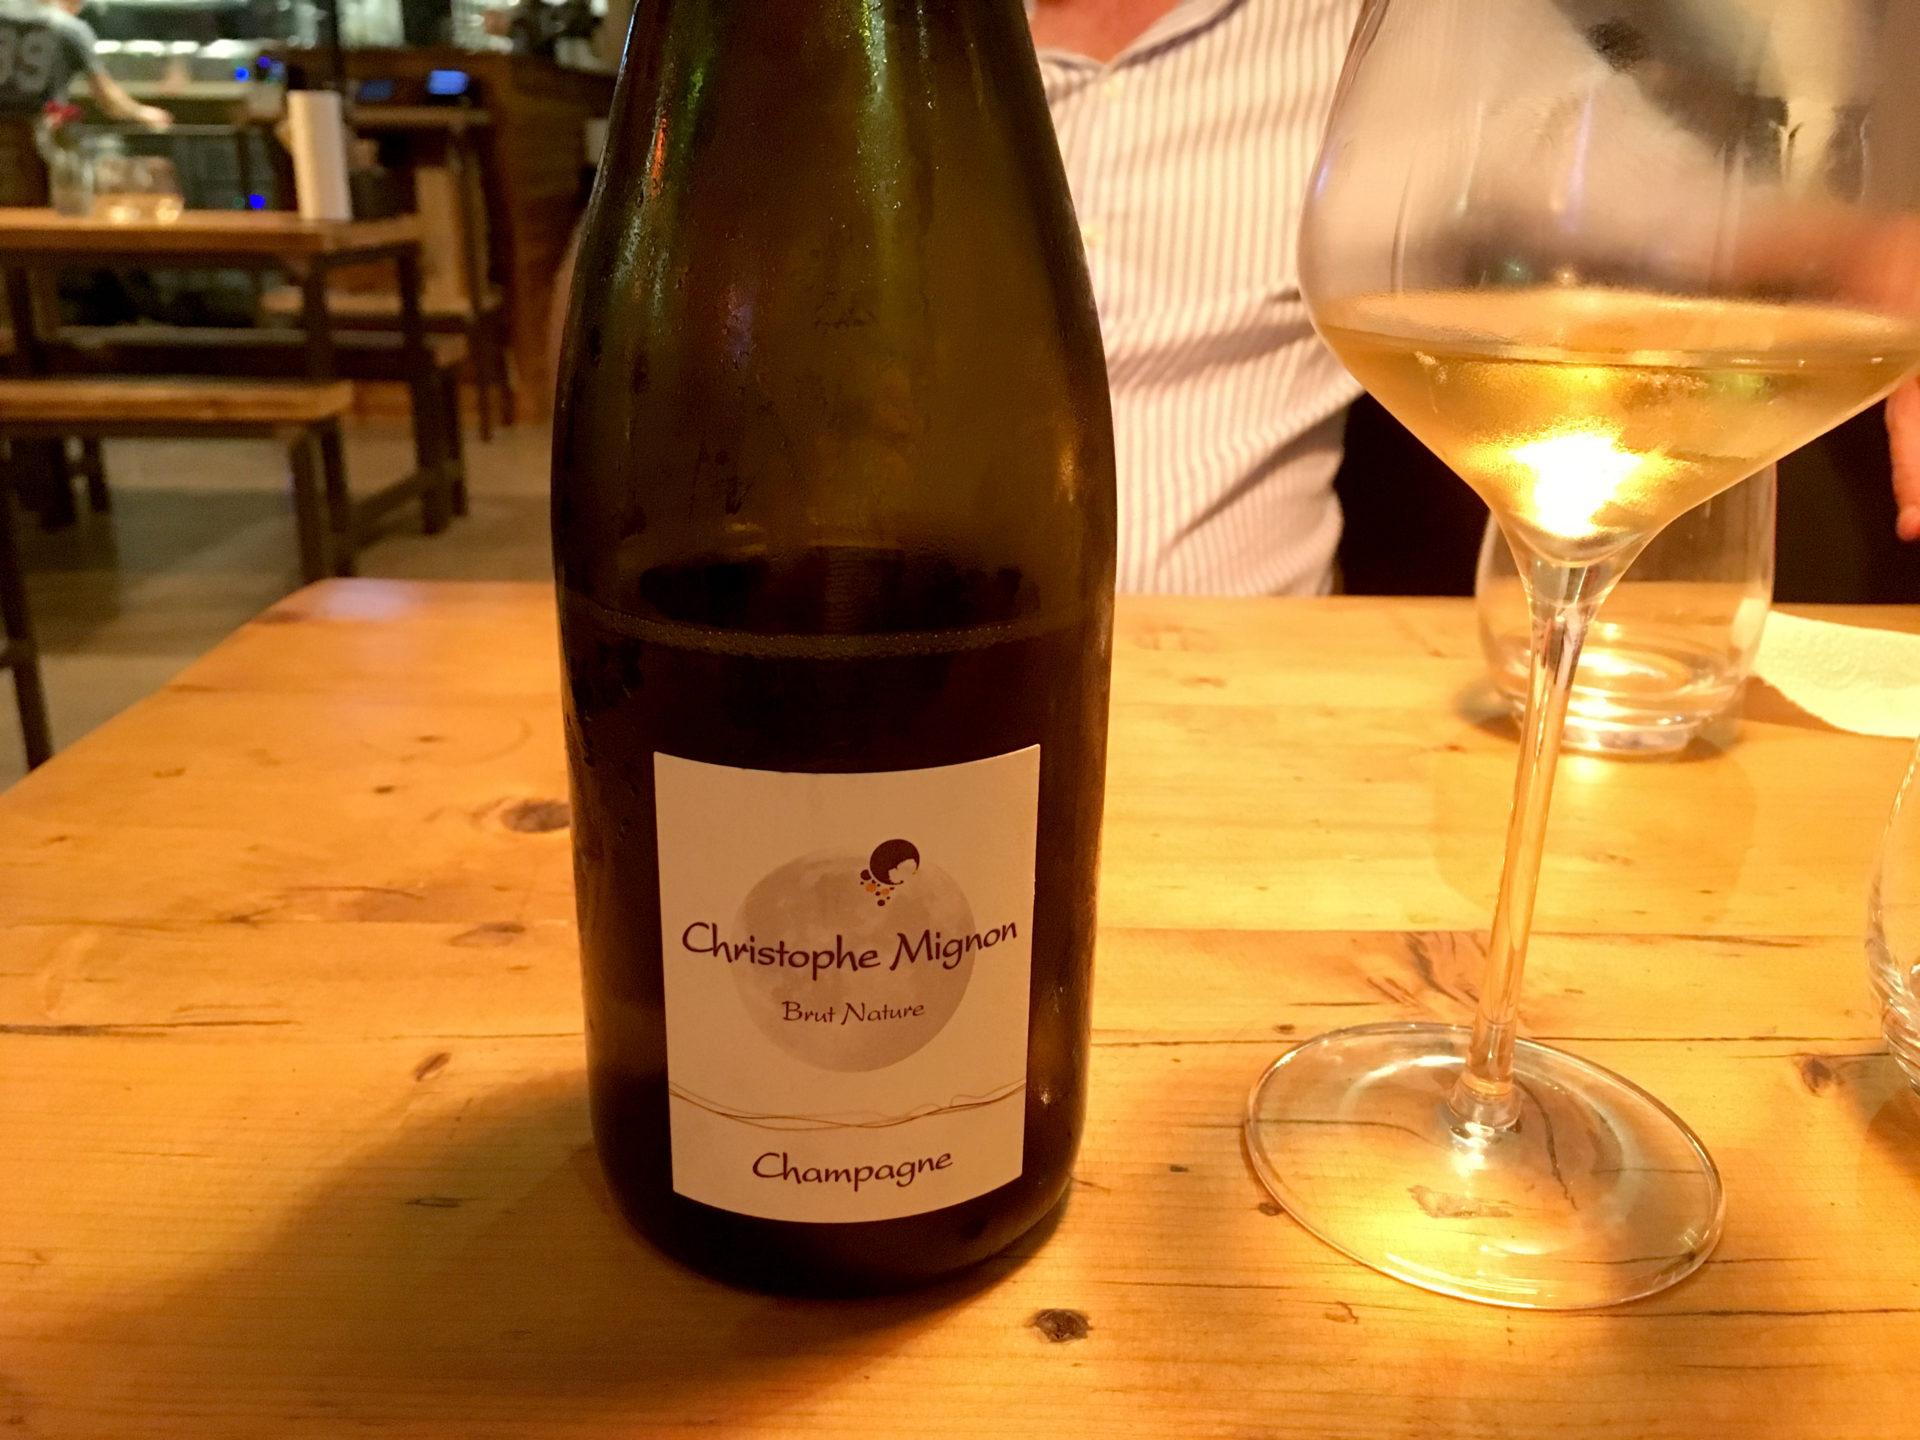 Christophe Mignon – Pinot Meunier Brut Nature